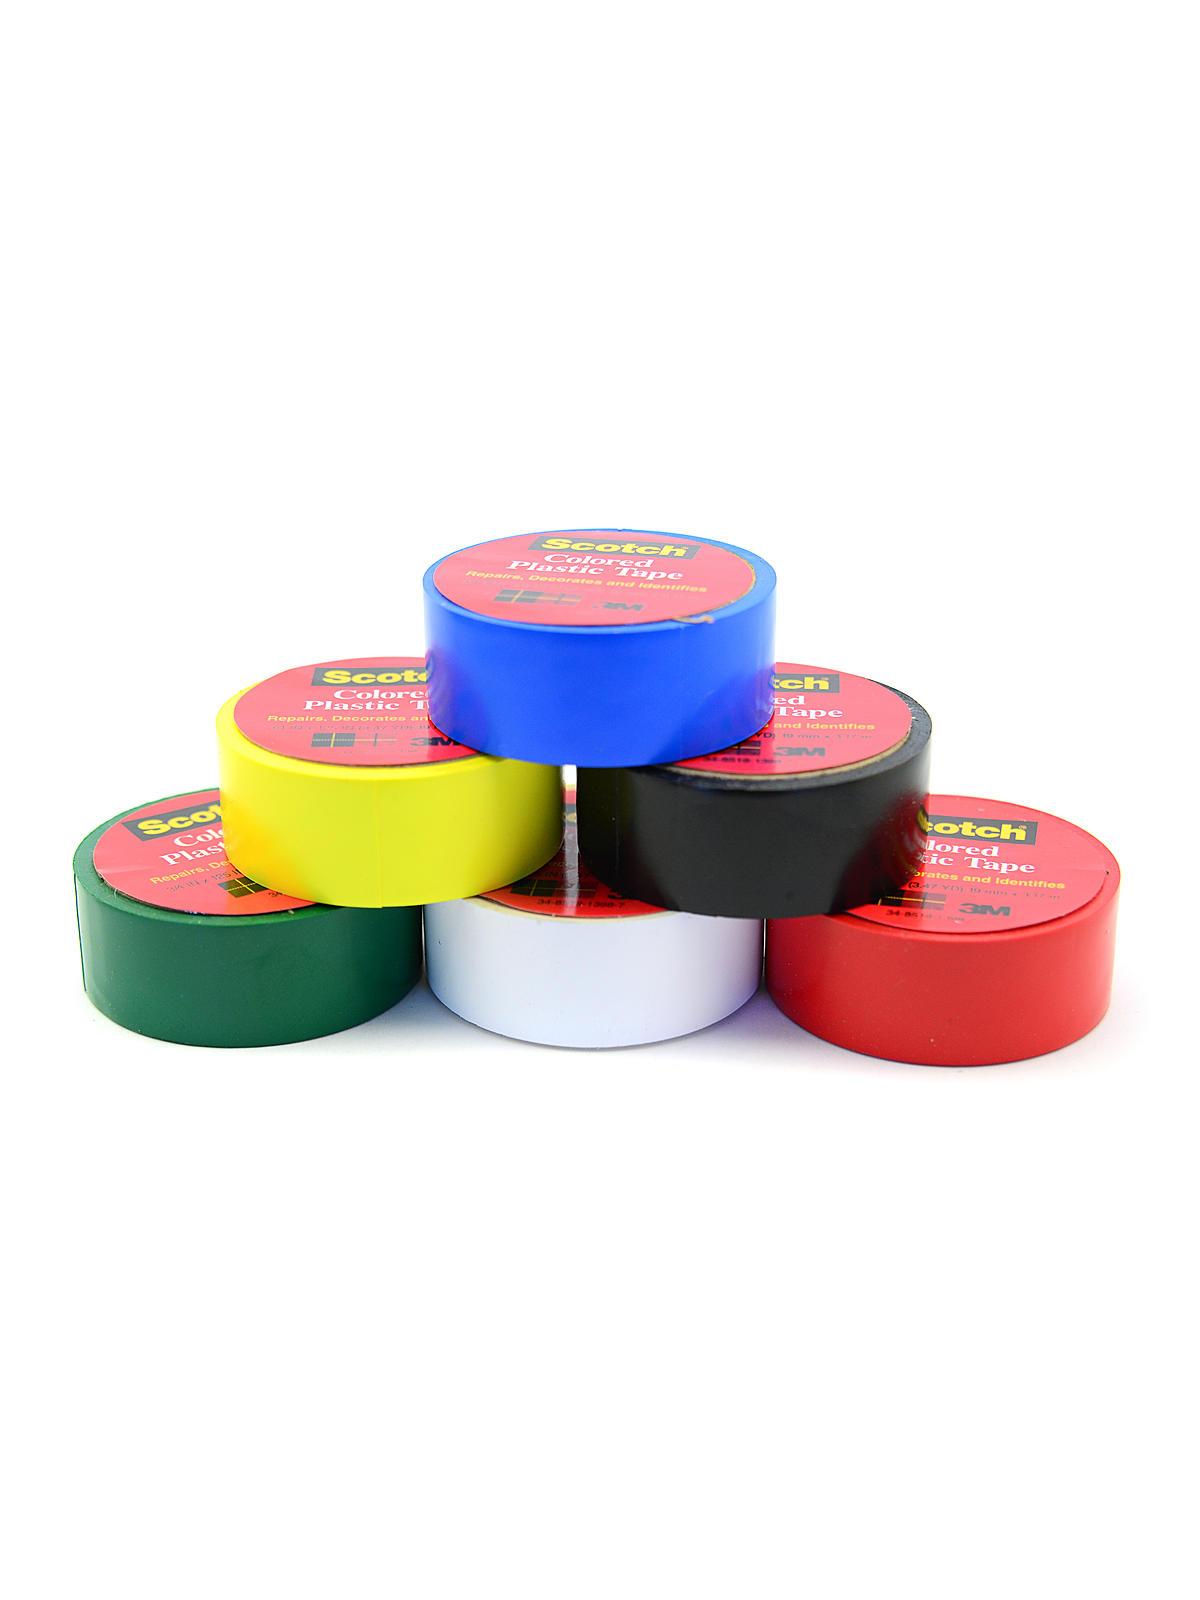 Scotch Colored Plastic Tape Misterart Com